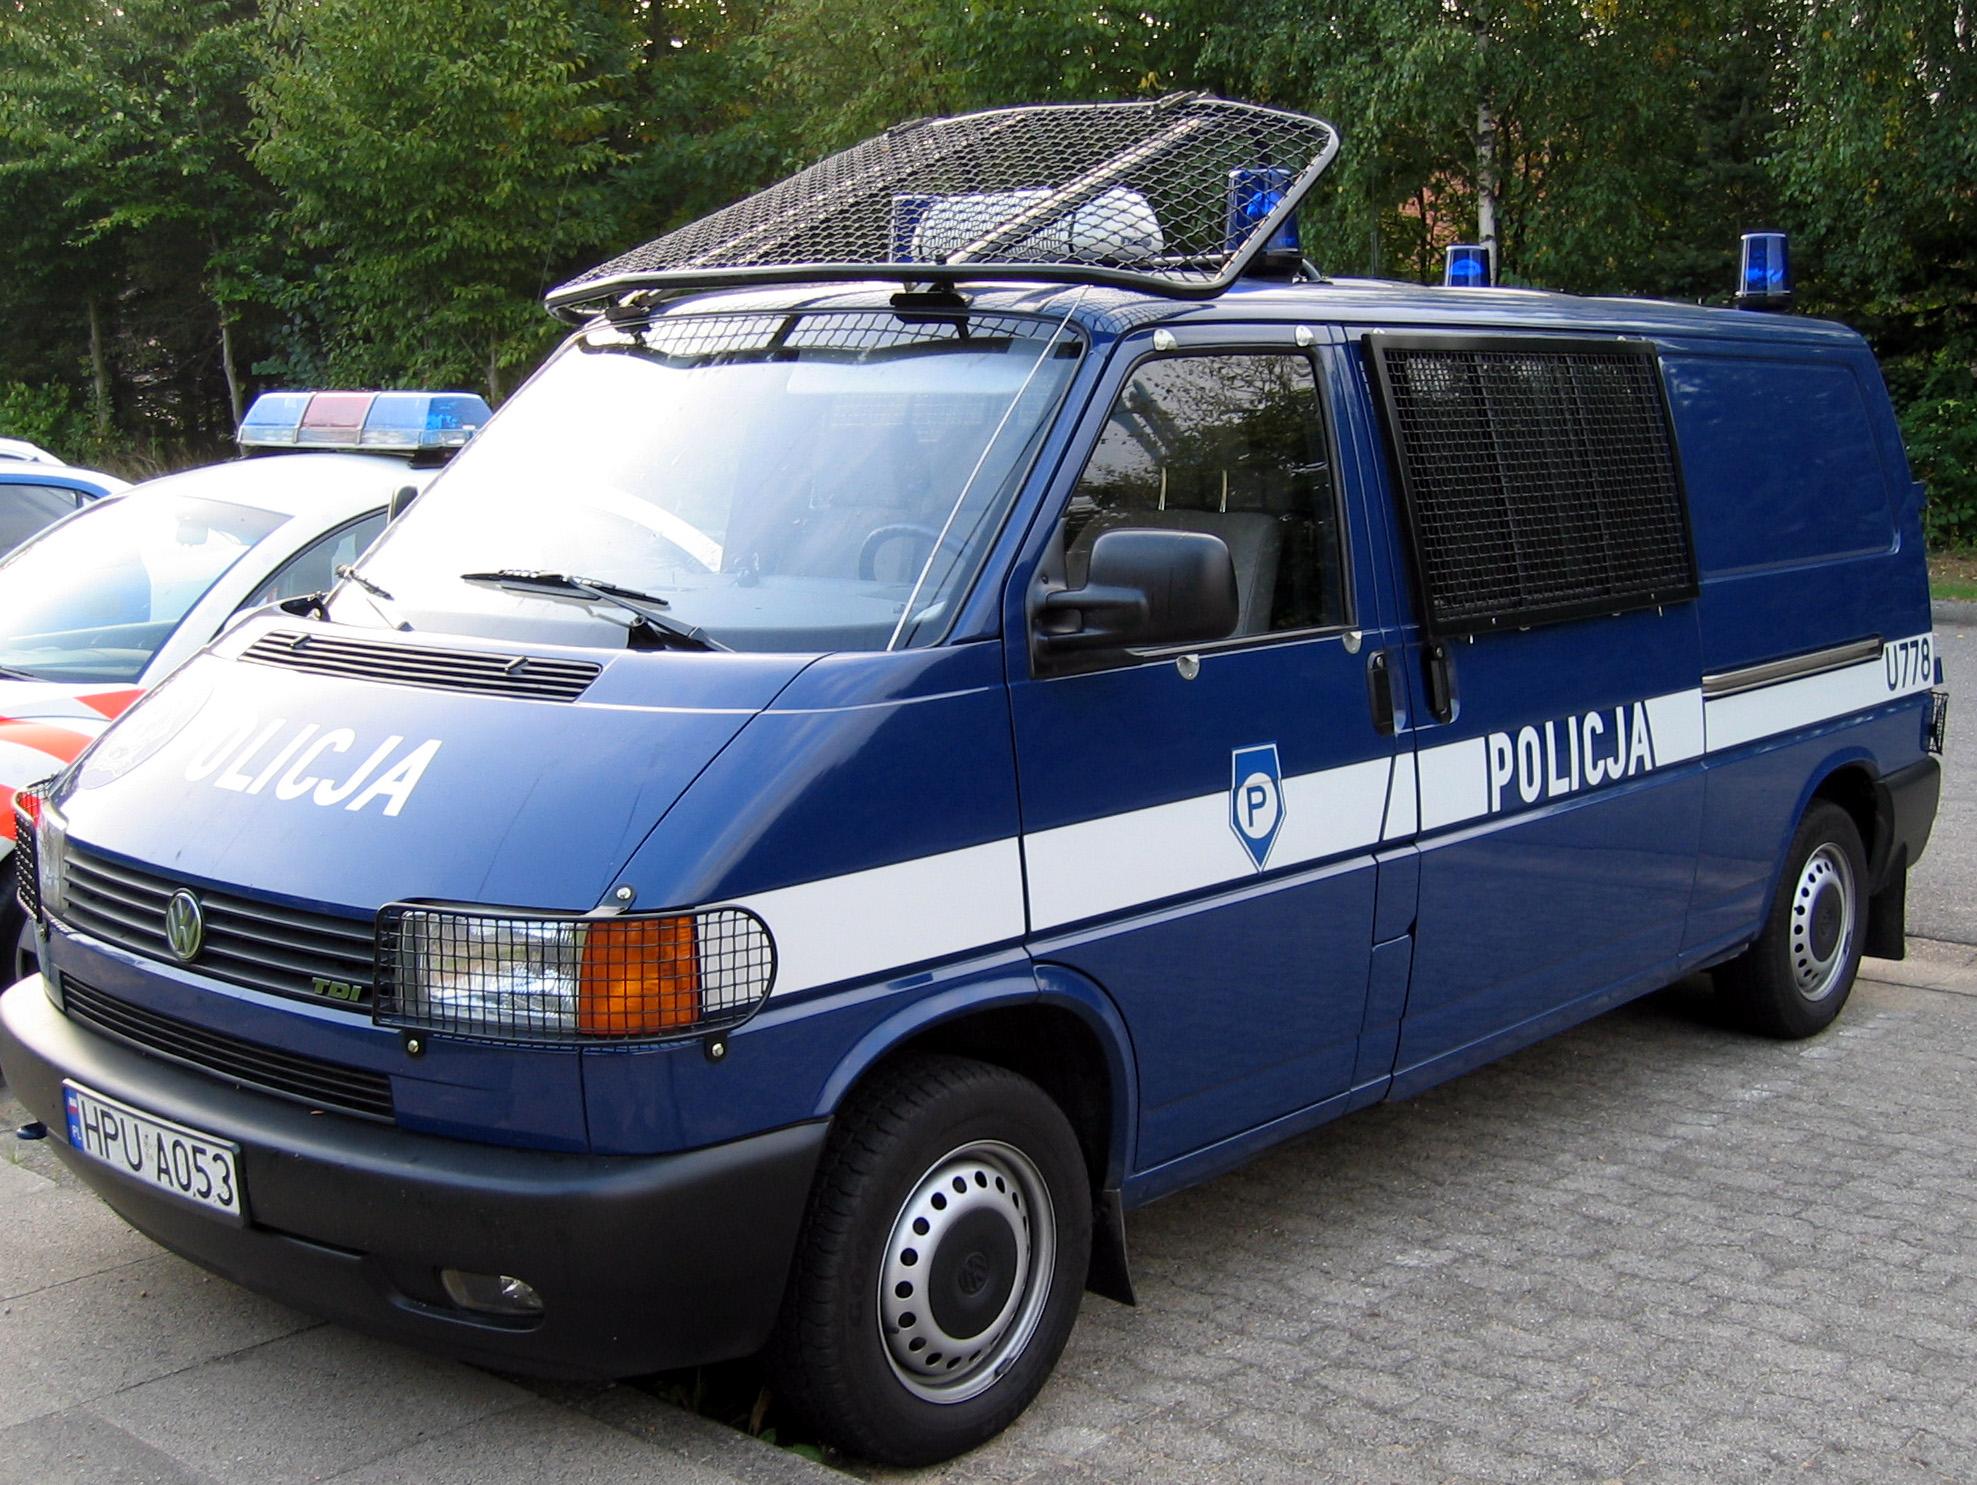 How To Polish A Car >> File:Polish police car 05.JPG - Wikimedia Commons